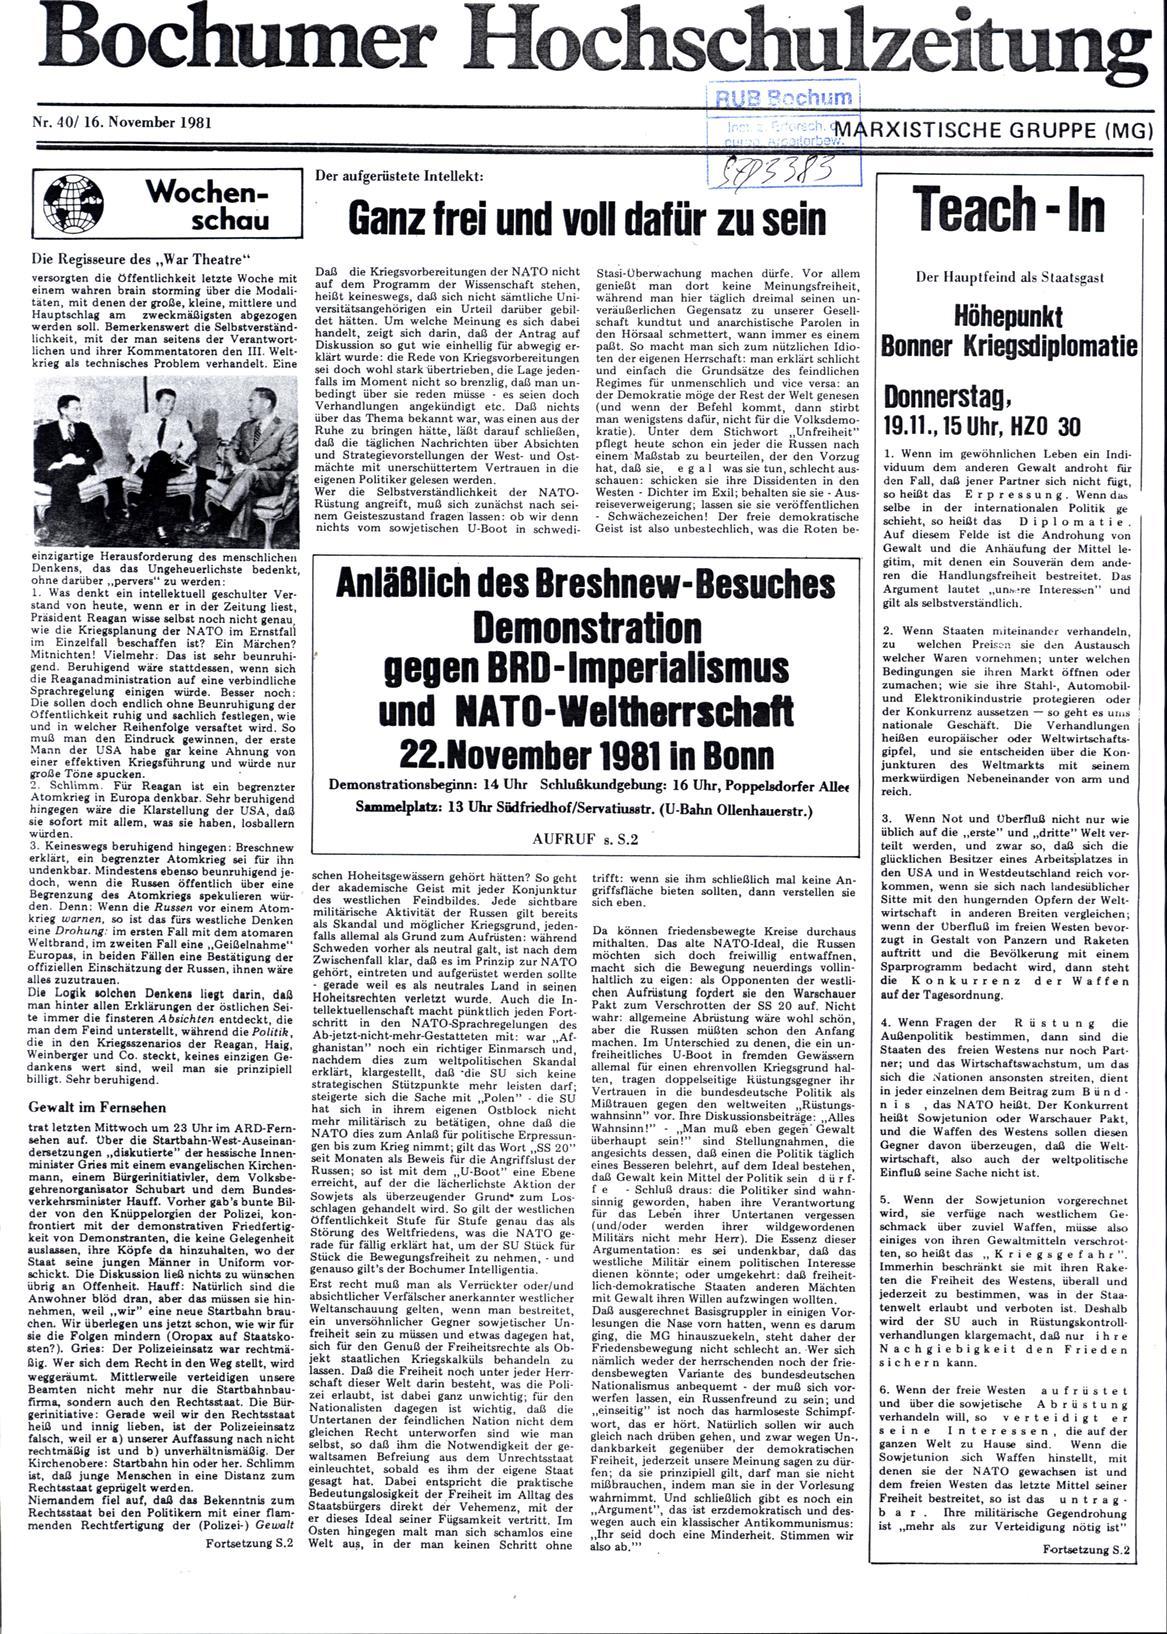 Bochum_BHZ_19811116_040_001